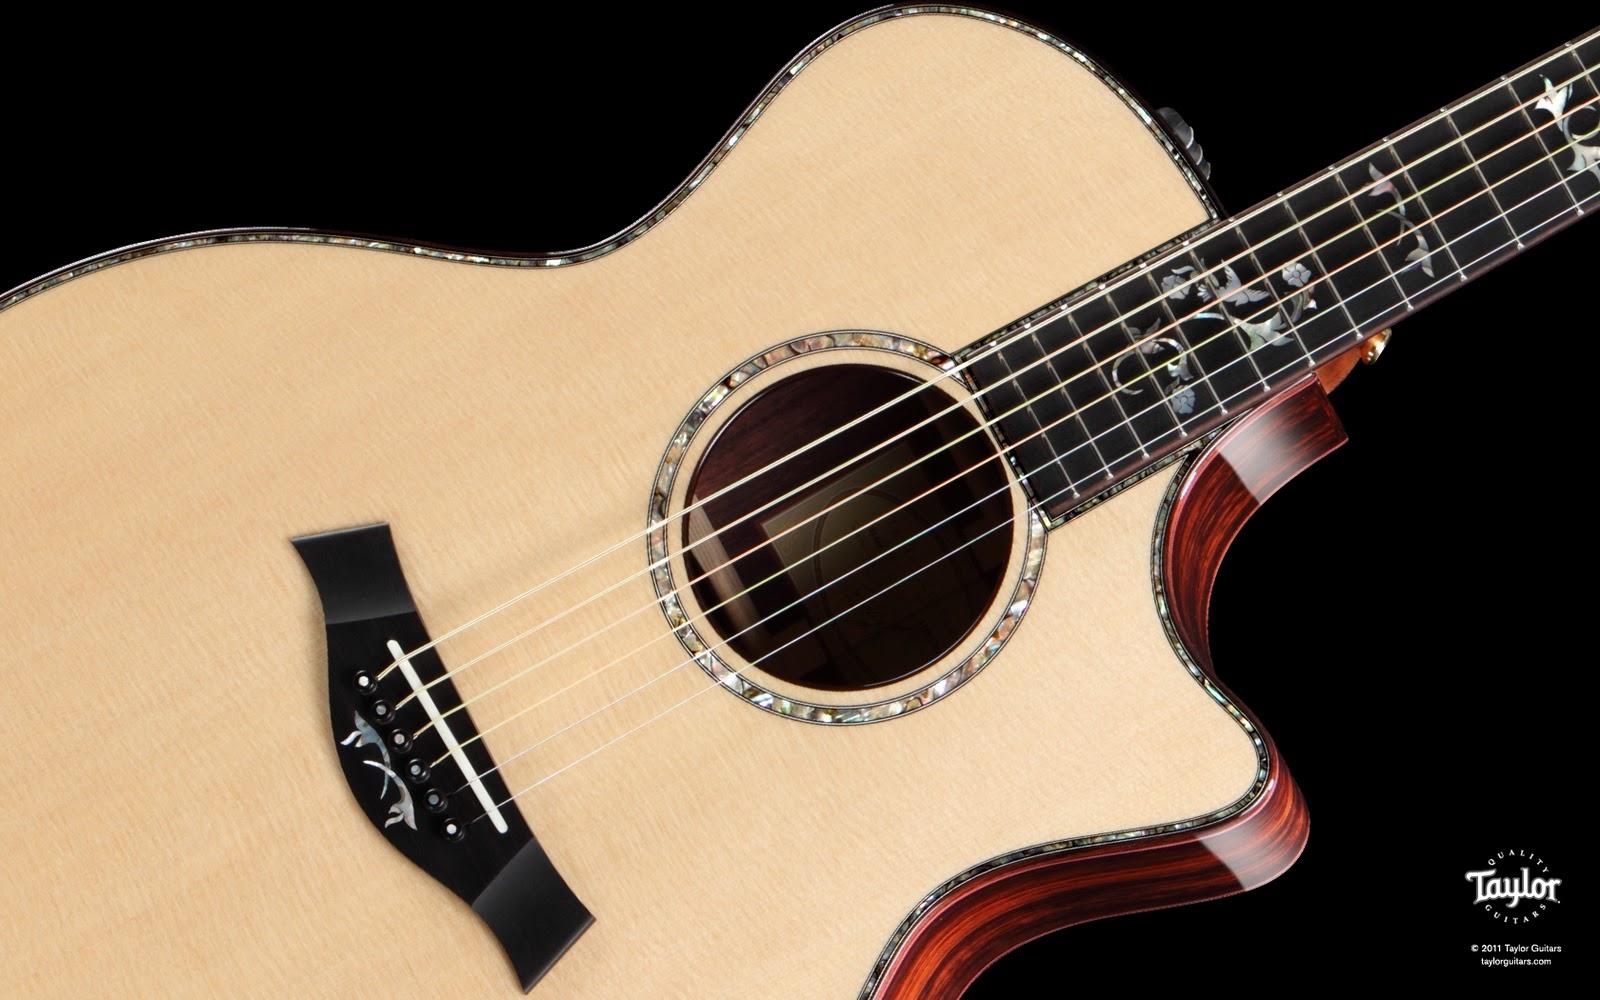 taylor guitars wallpapers - photo #1